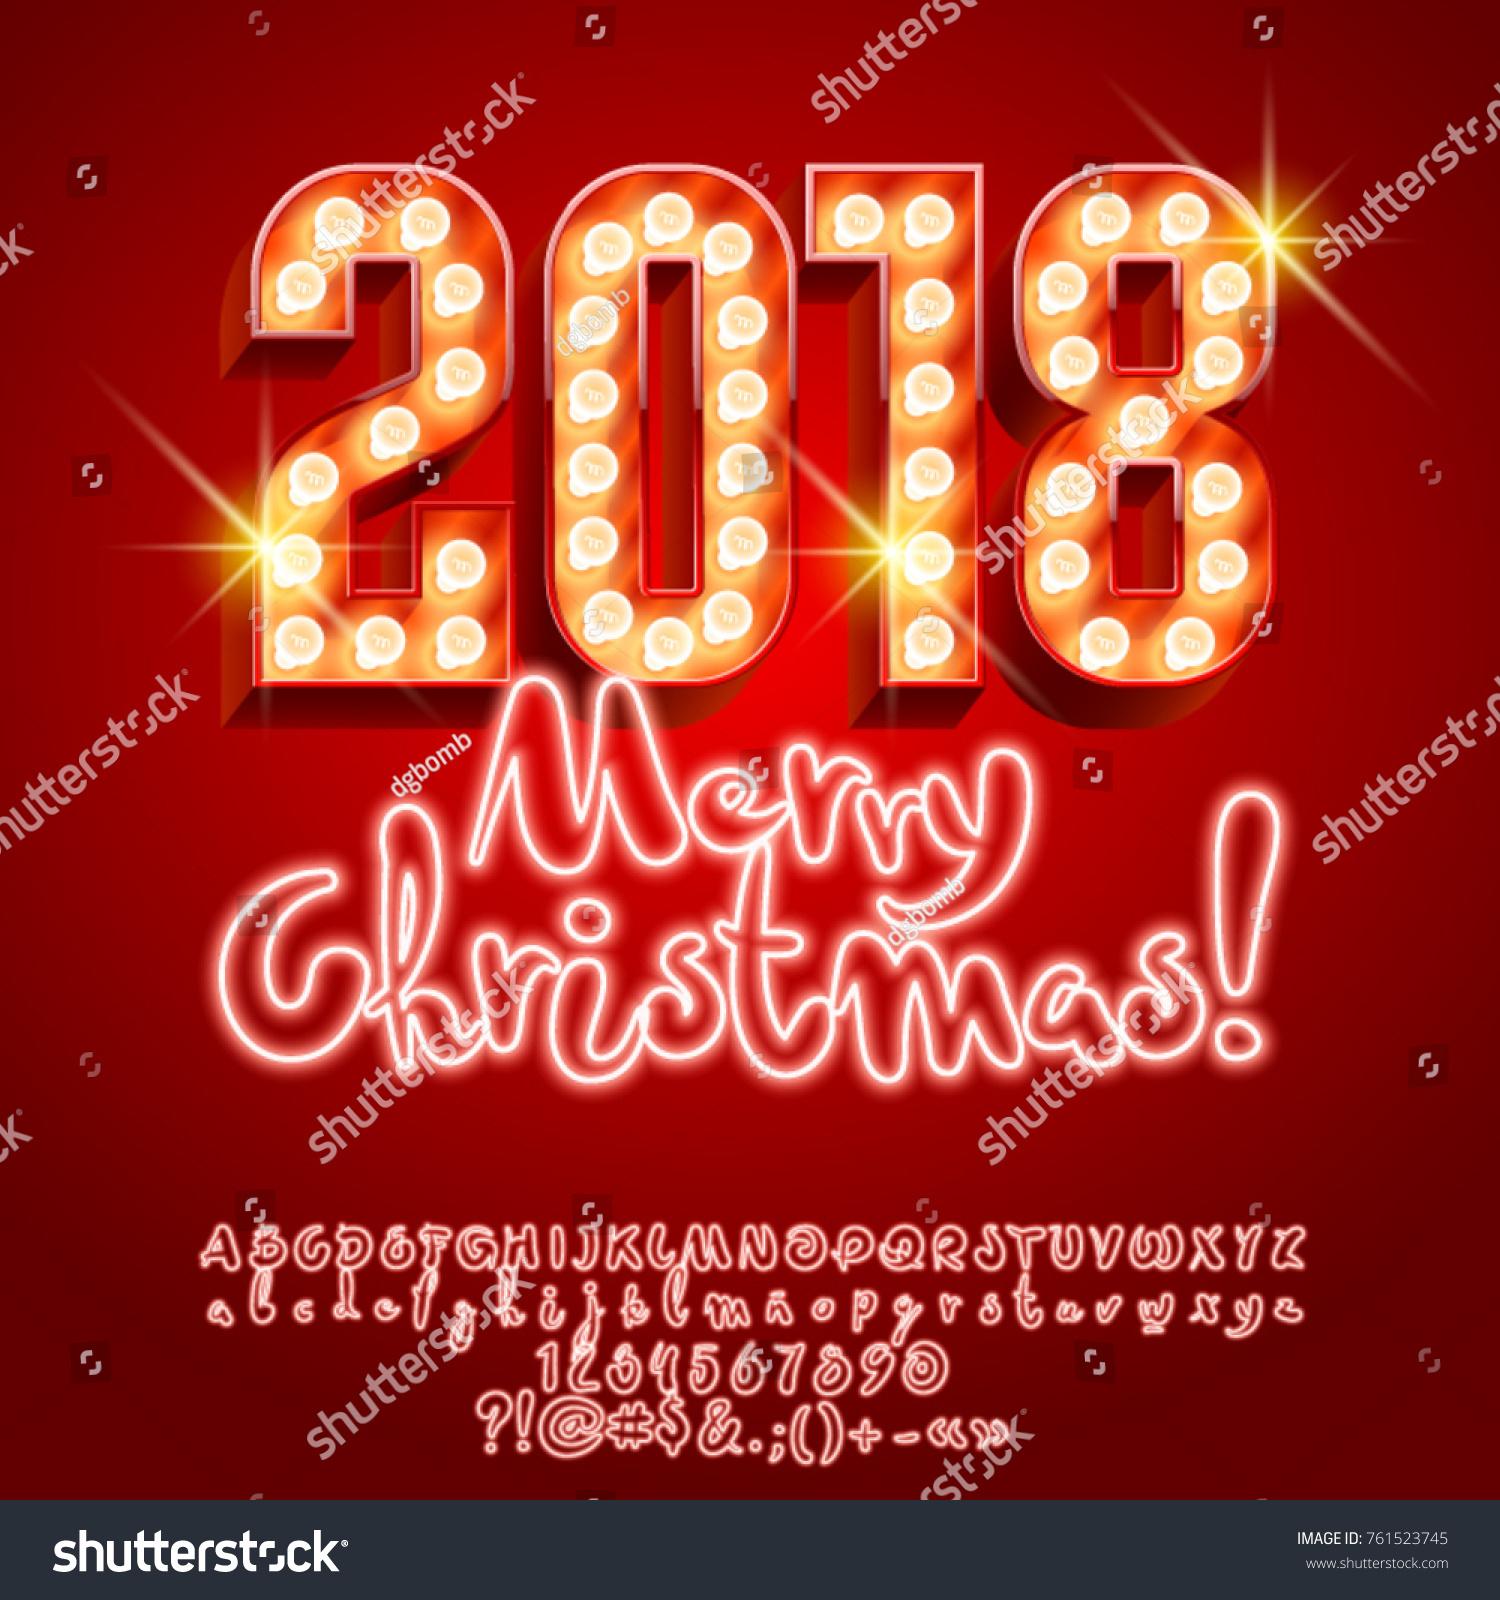 Vector Light Merry Christmas 2018 Greeting Stock Vector Royalty